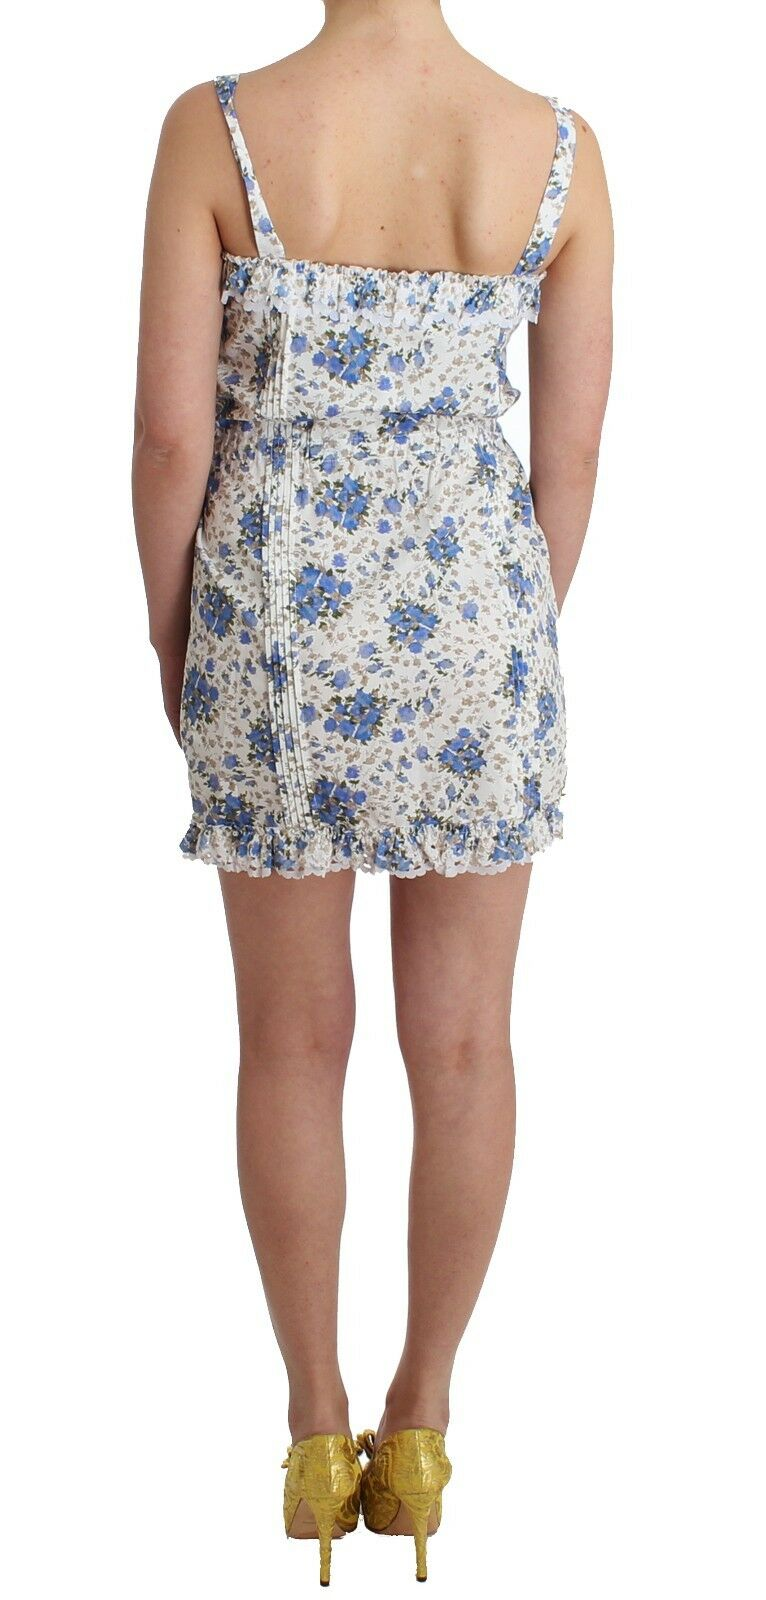 NEW  380 Ermanno Scervino Dress Beachwear bluee Floral Floral Floral Beach Mini Short IT46 US12 60a823